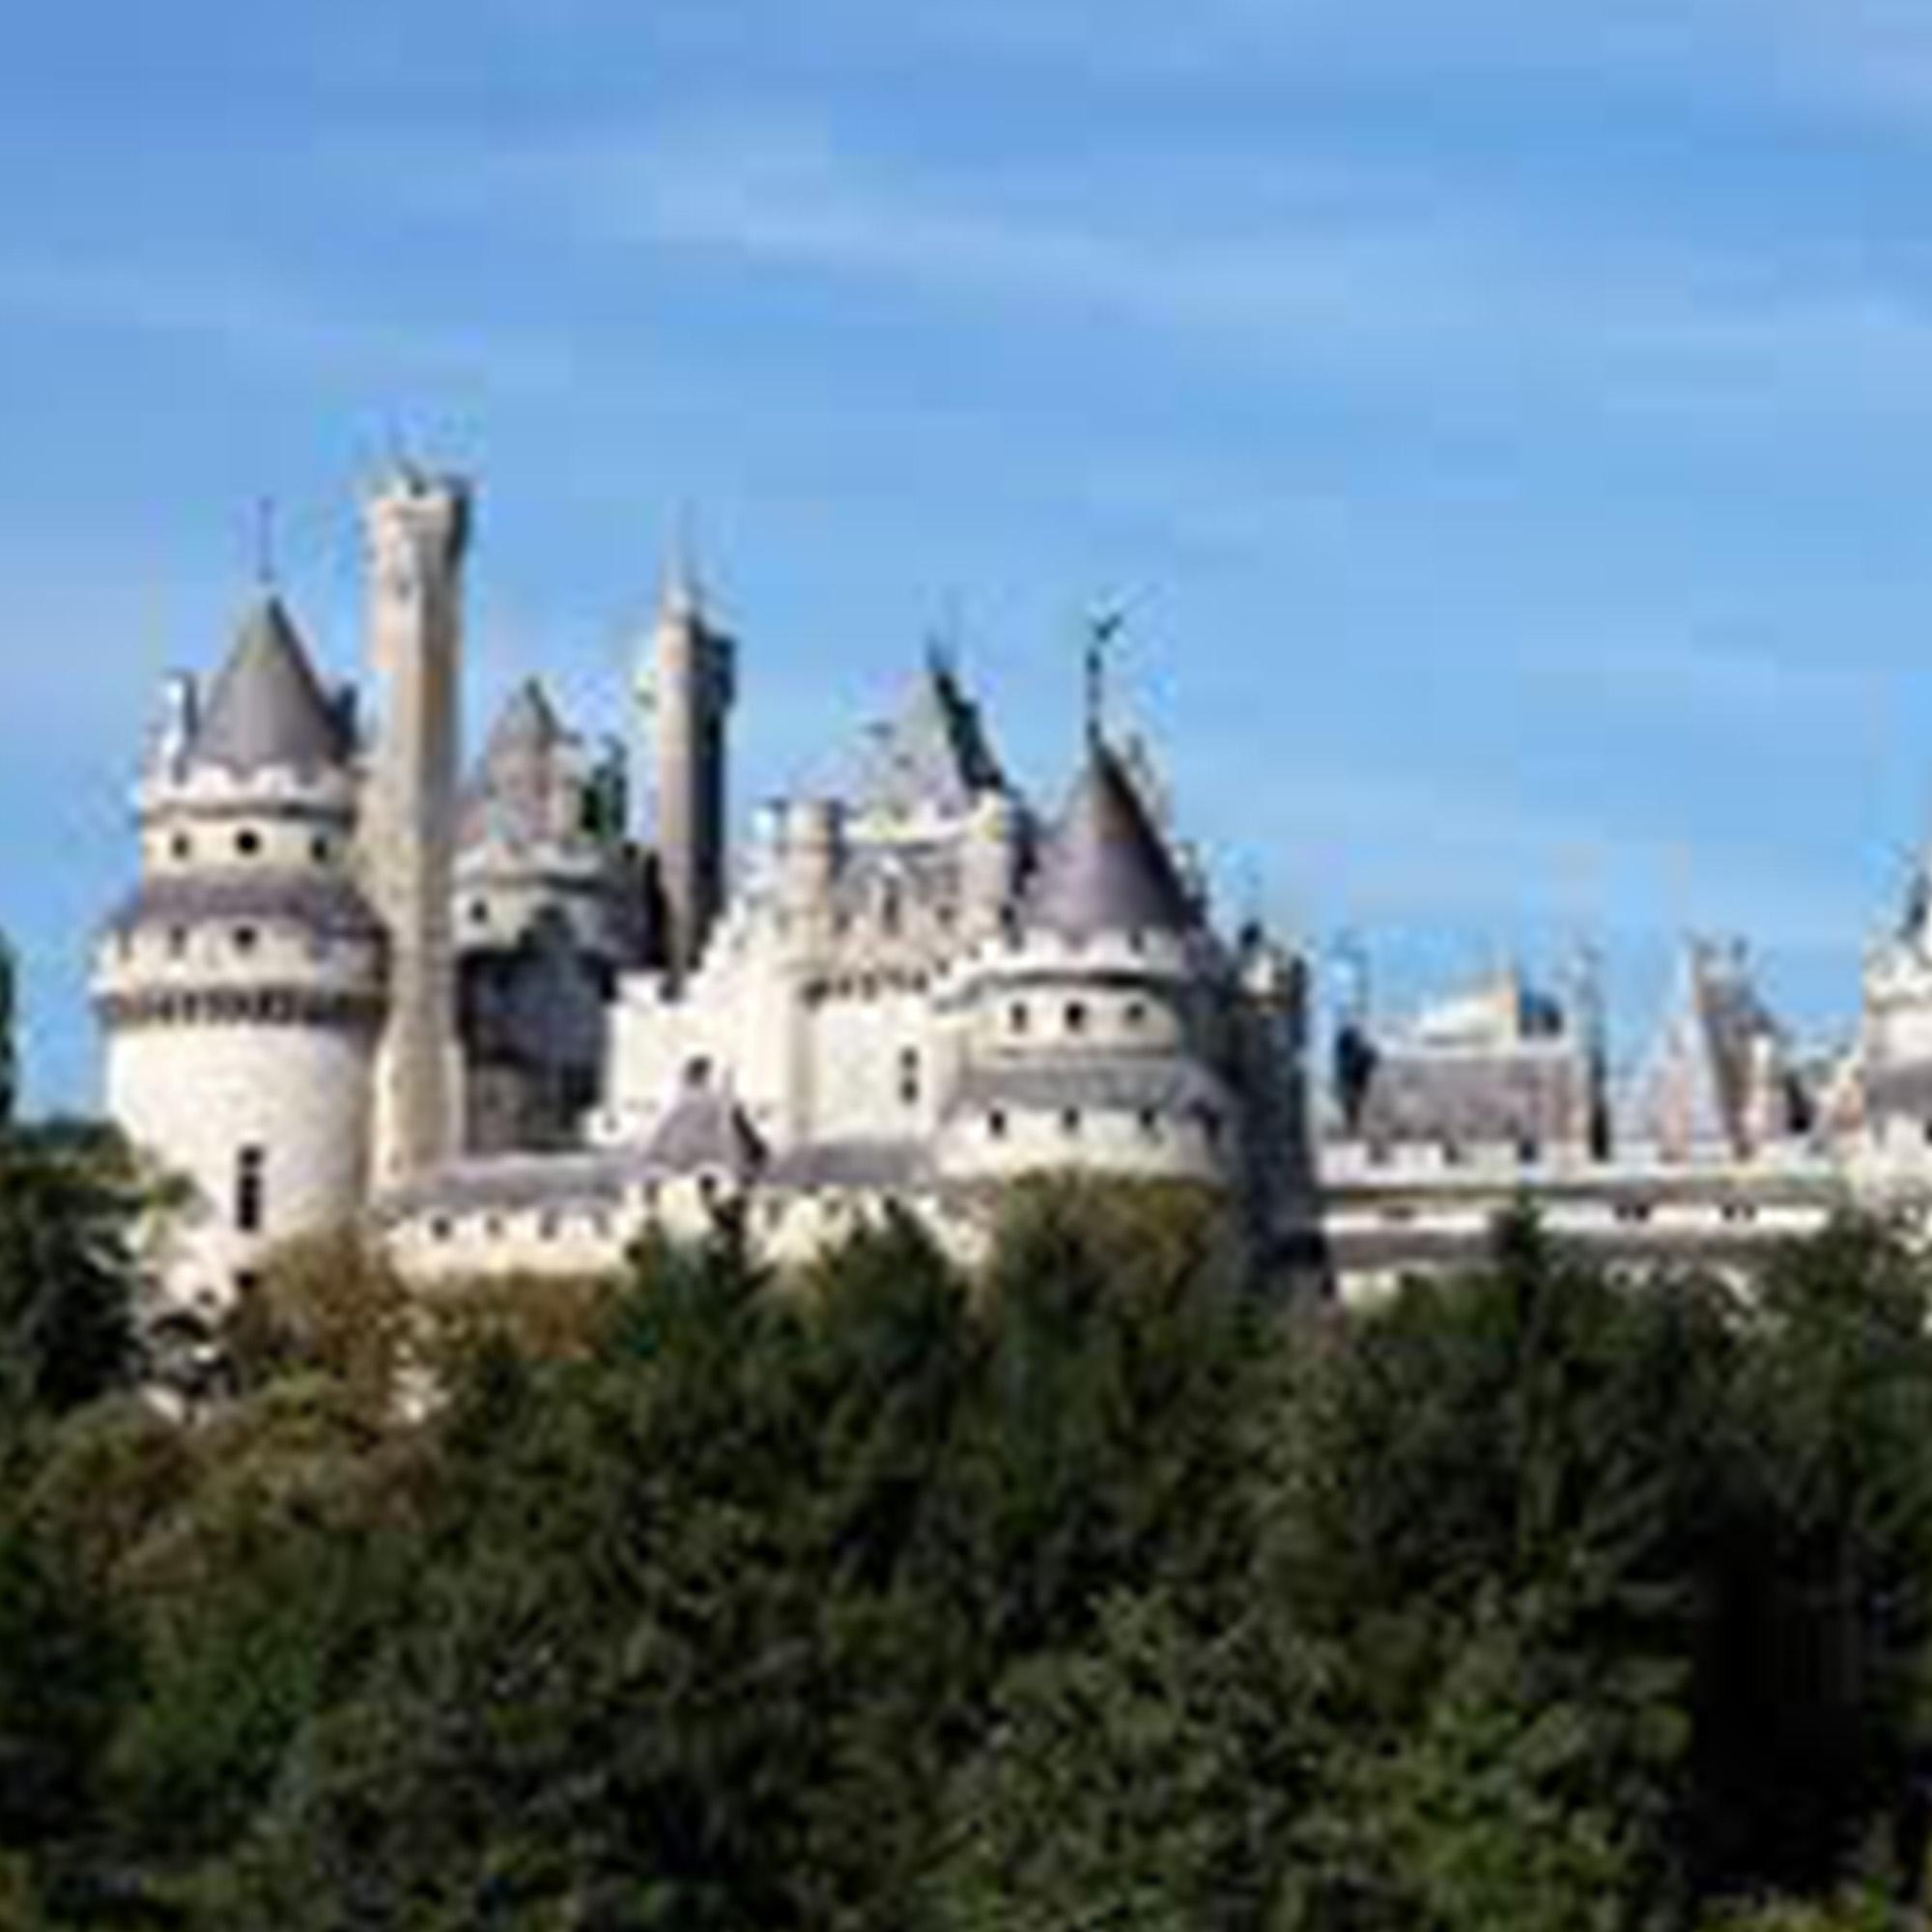 gîte_saint_germain_oise_versigny_0002_Château de Pierrefonds